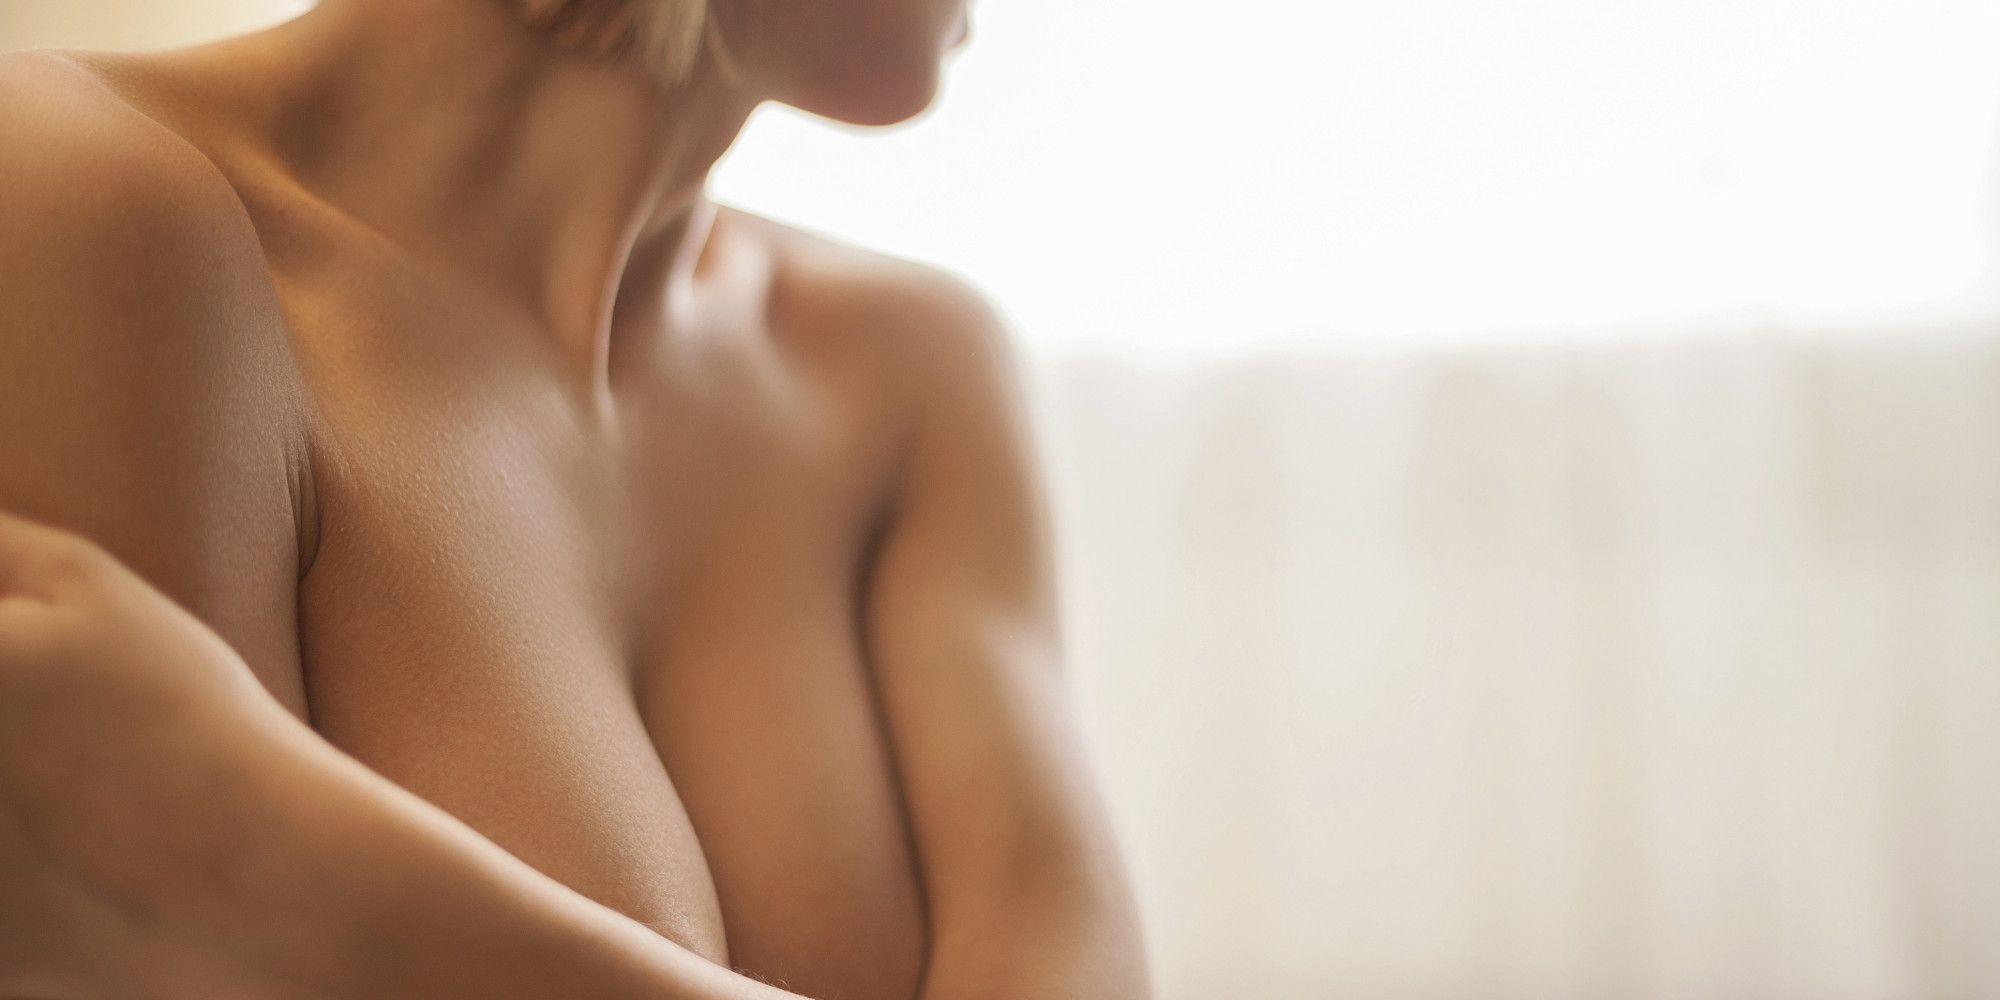 Back boob breaking